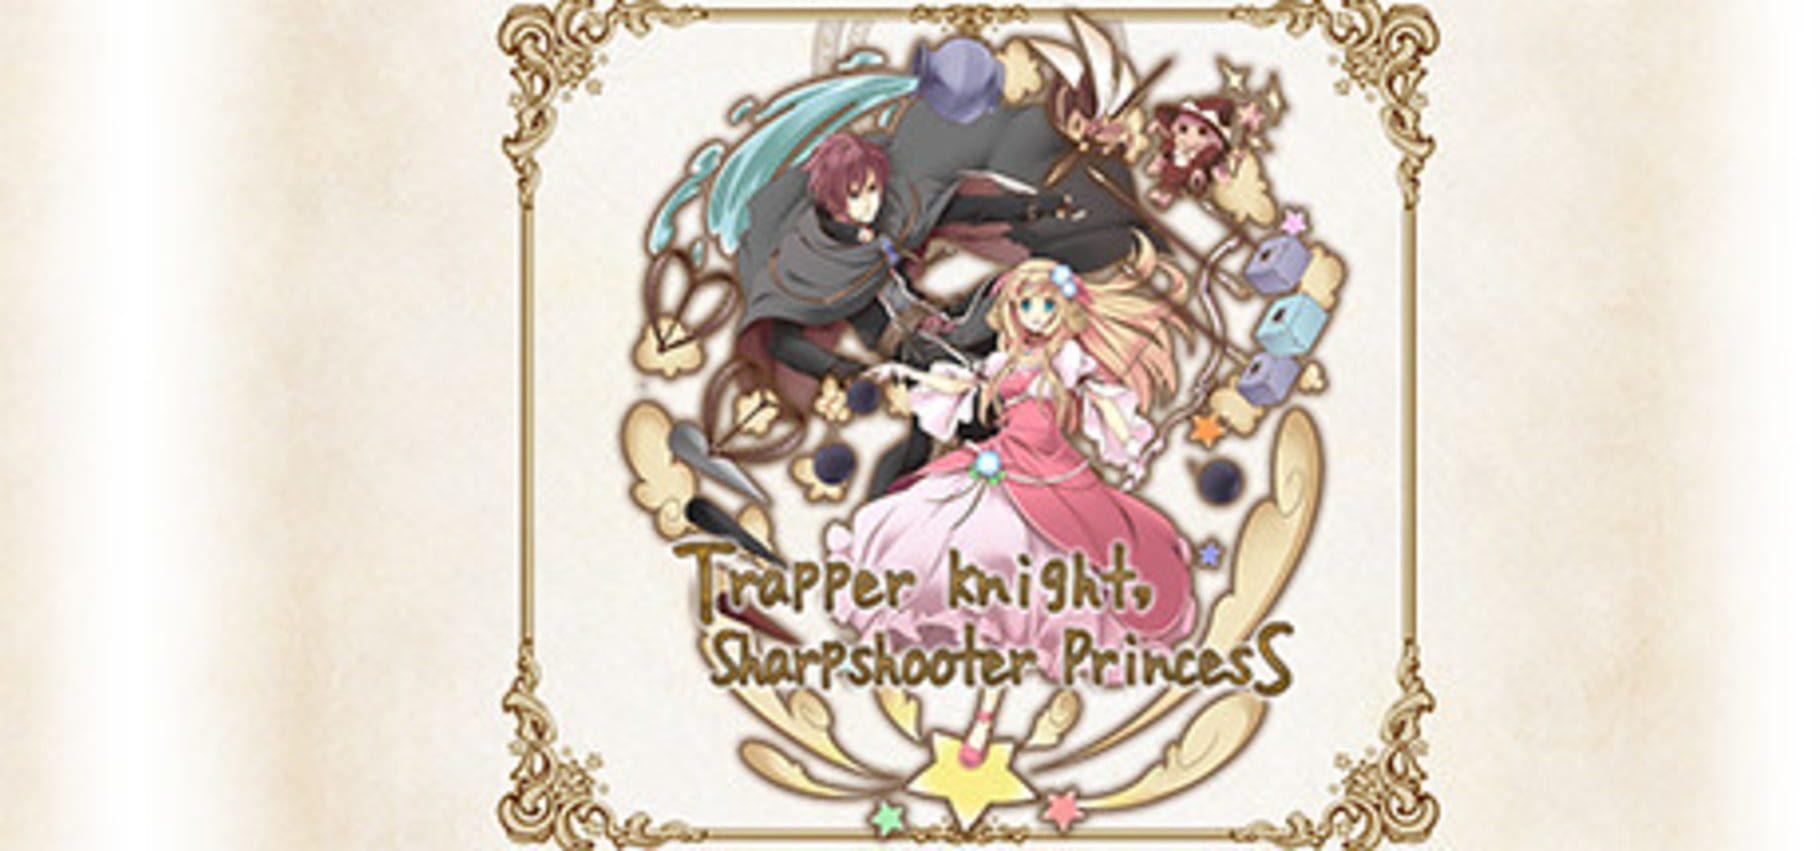 buy Trapper Knight, Sharpshooter Princess cd key for all platform